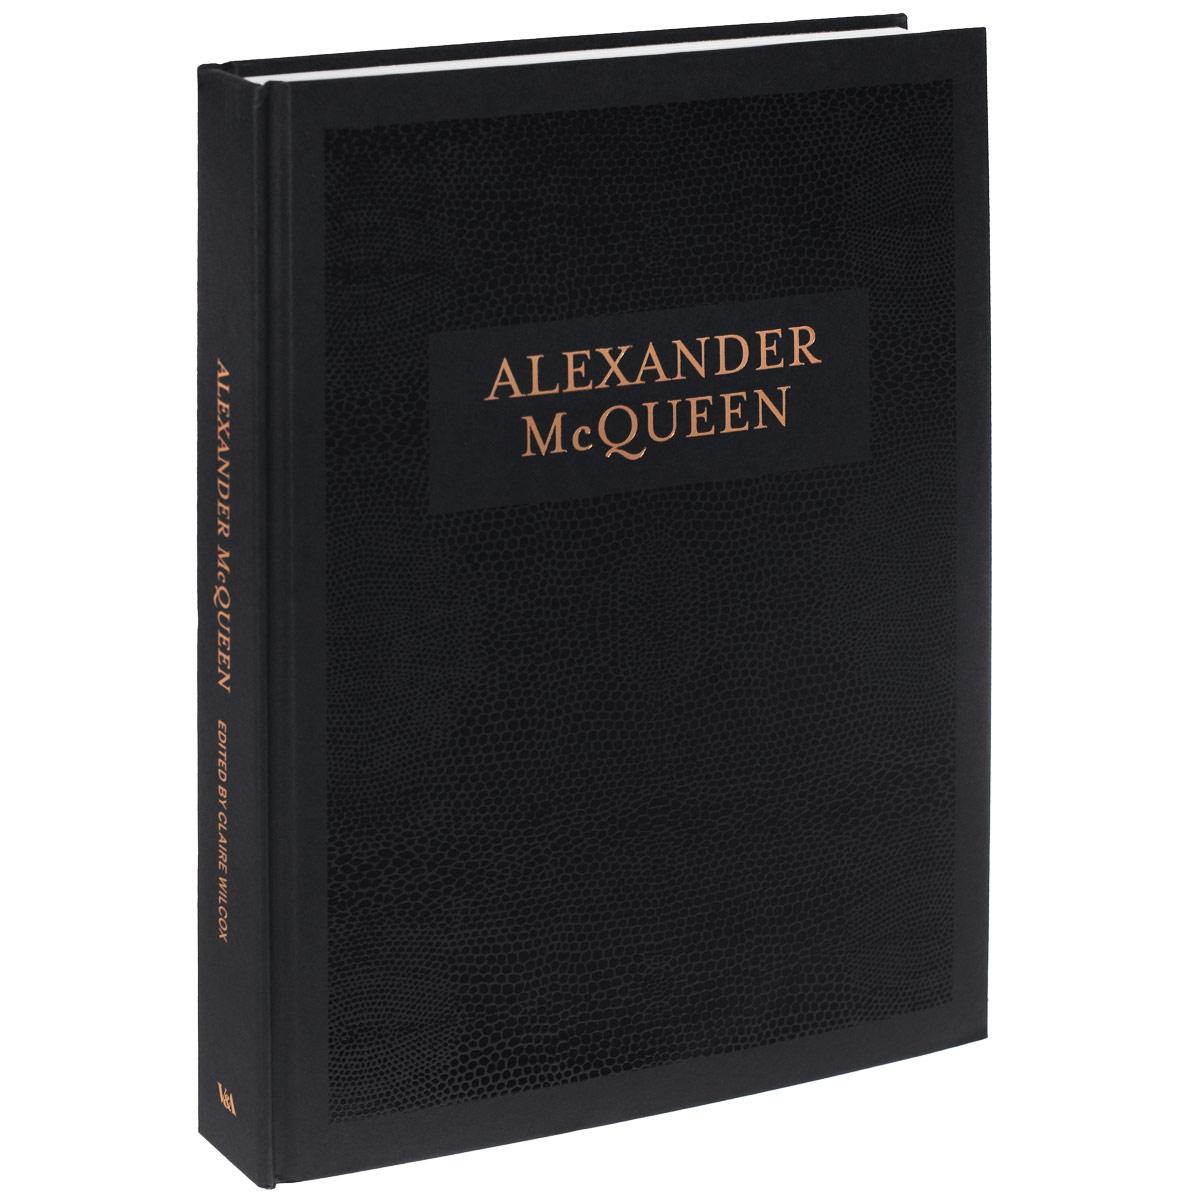 Alexander McQueen hemant kumar jha nirad c chaudhuri his mind and art